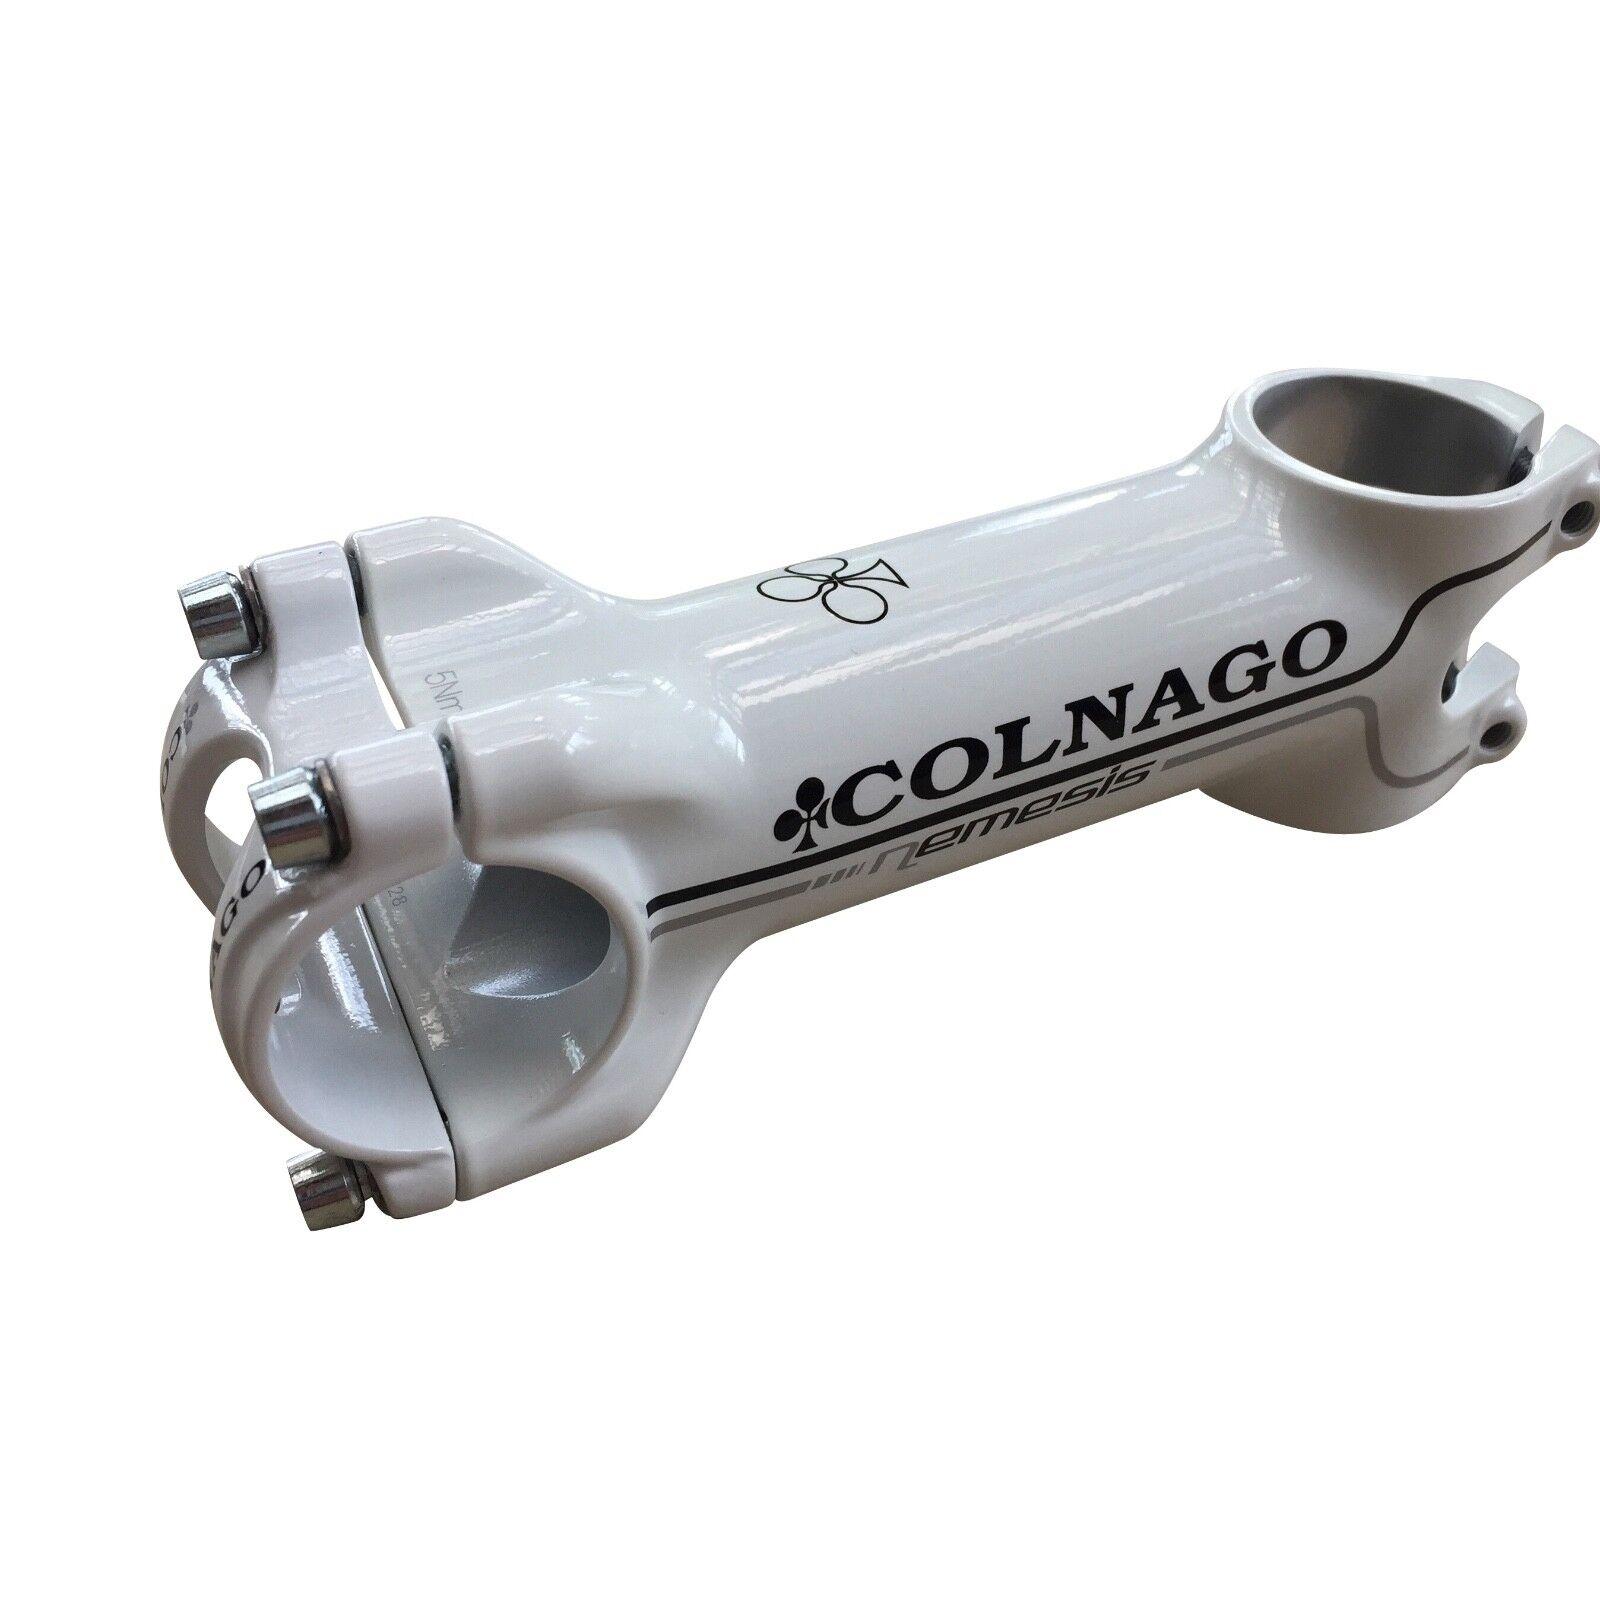 Black or White New Colnago Nemesis Road Bike Stem 90, 100, 110 or 120mm